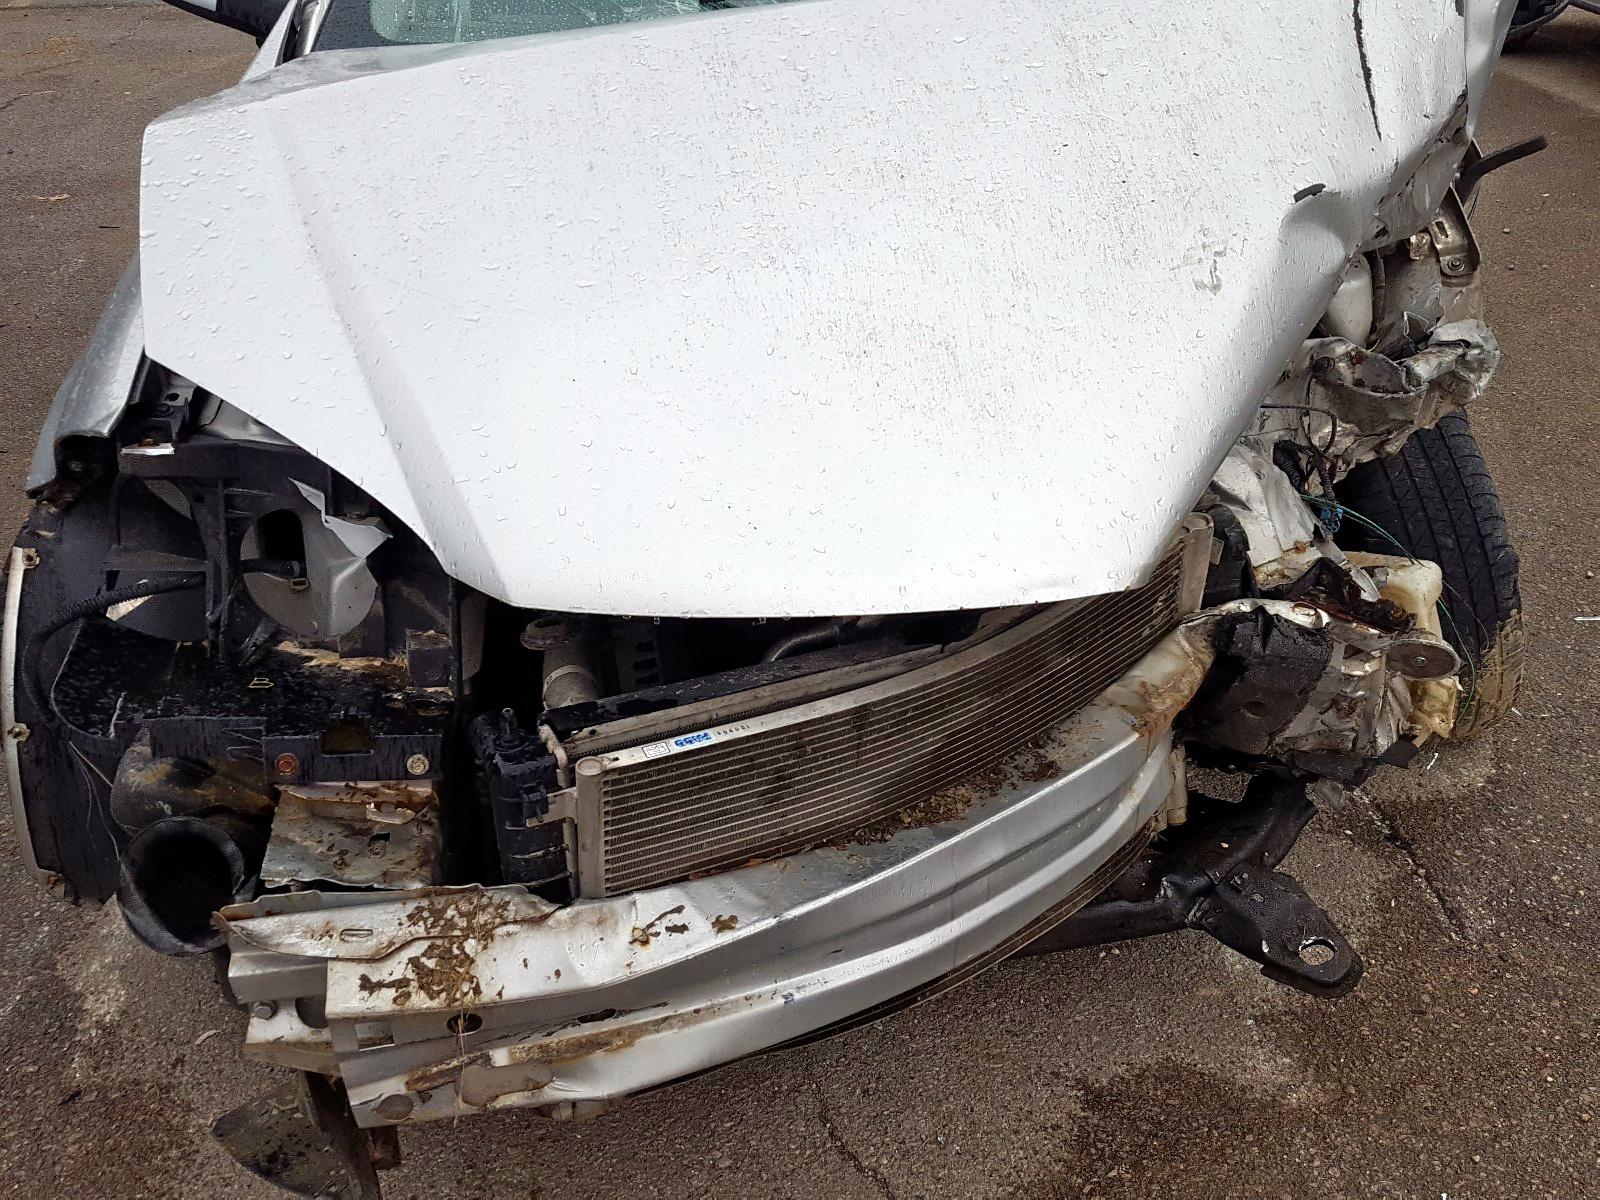 1G1AD5F50A7224606 - 2010 Chevrolet Cobalt 1Lt 2.2L inside view